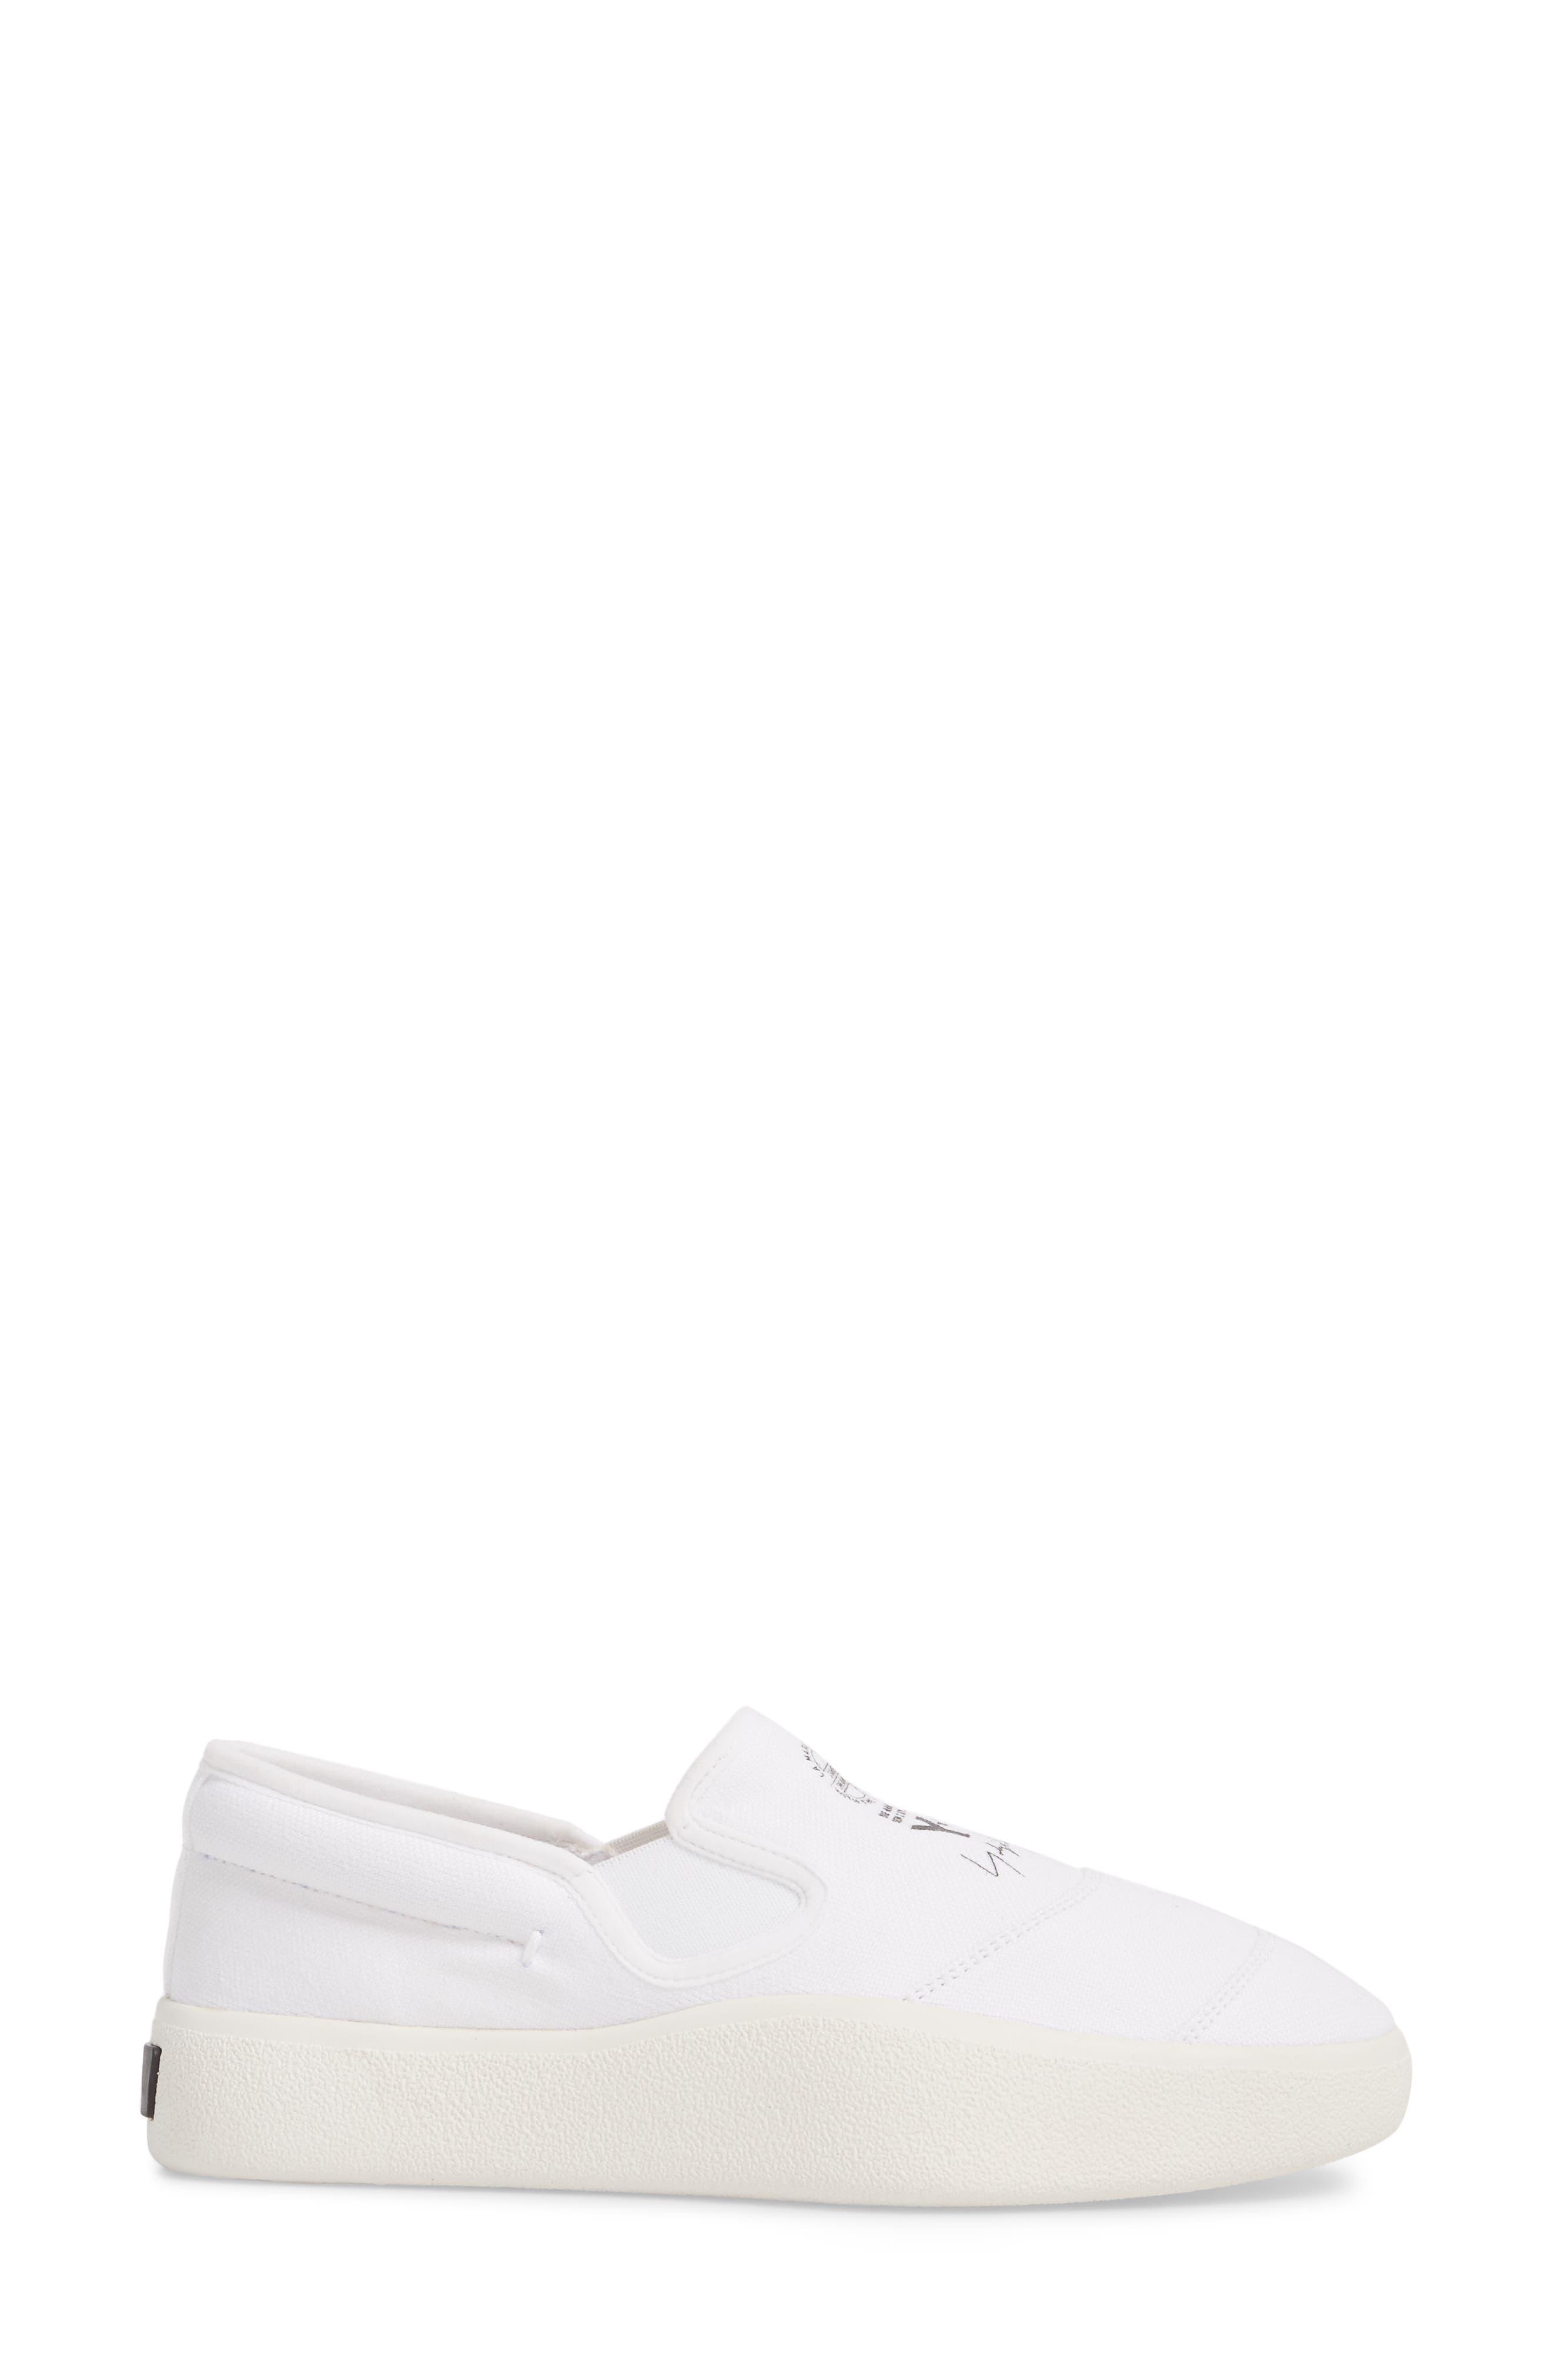 Tangutsu Slip-On Sneaker,                             Alternate thumbnail 3, color,                             White / Black / Core White